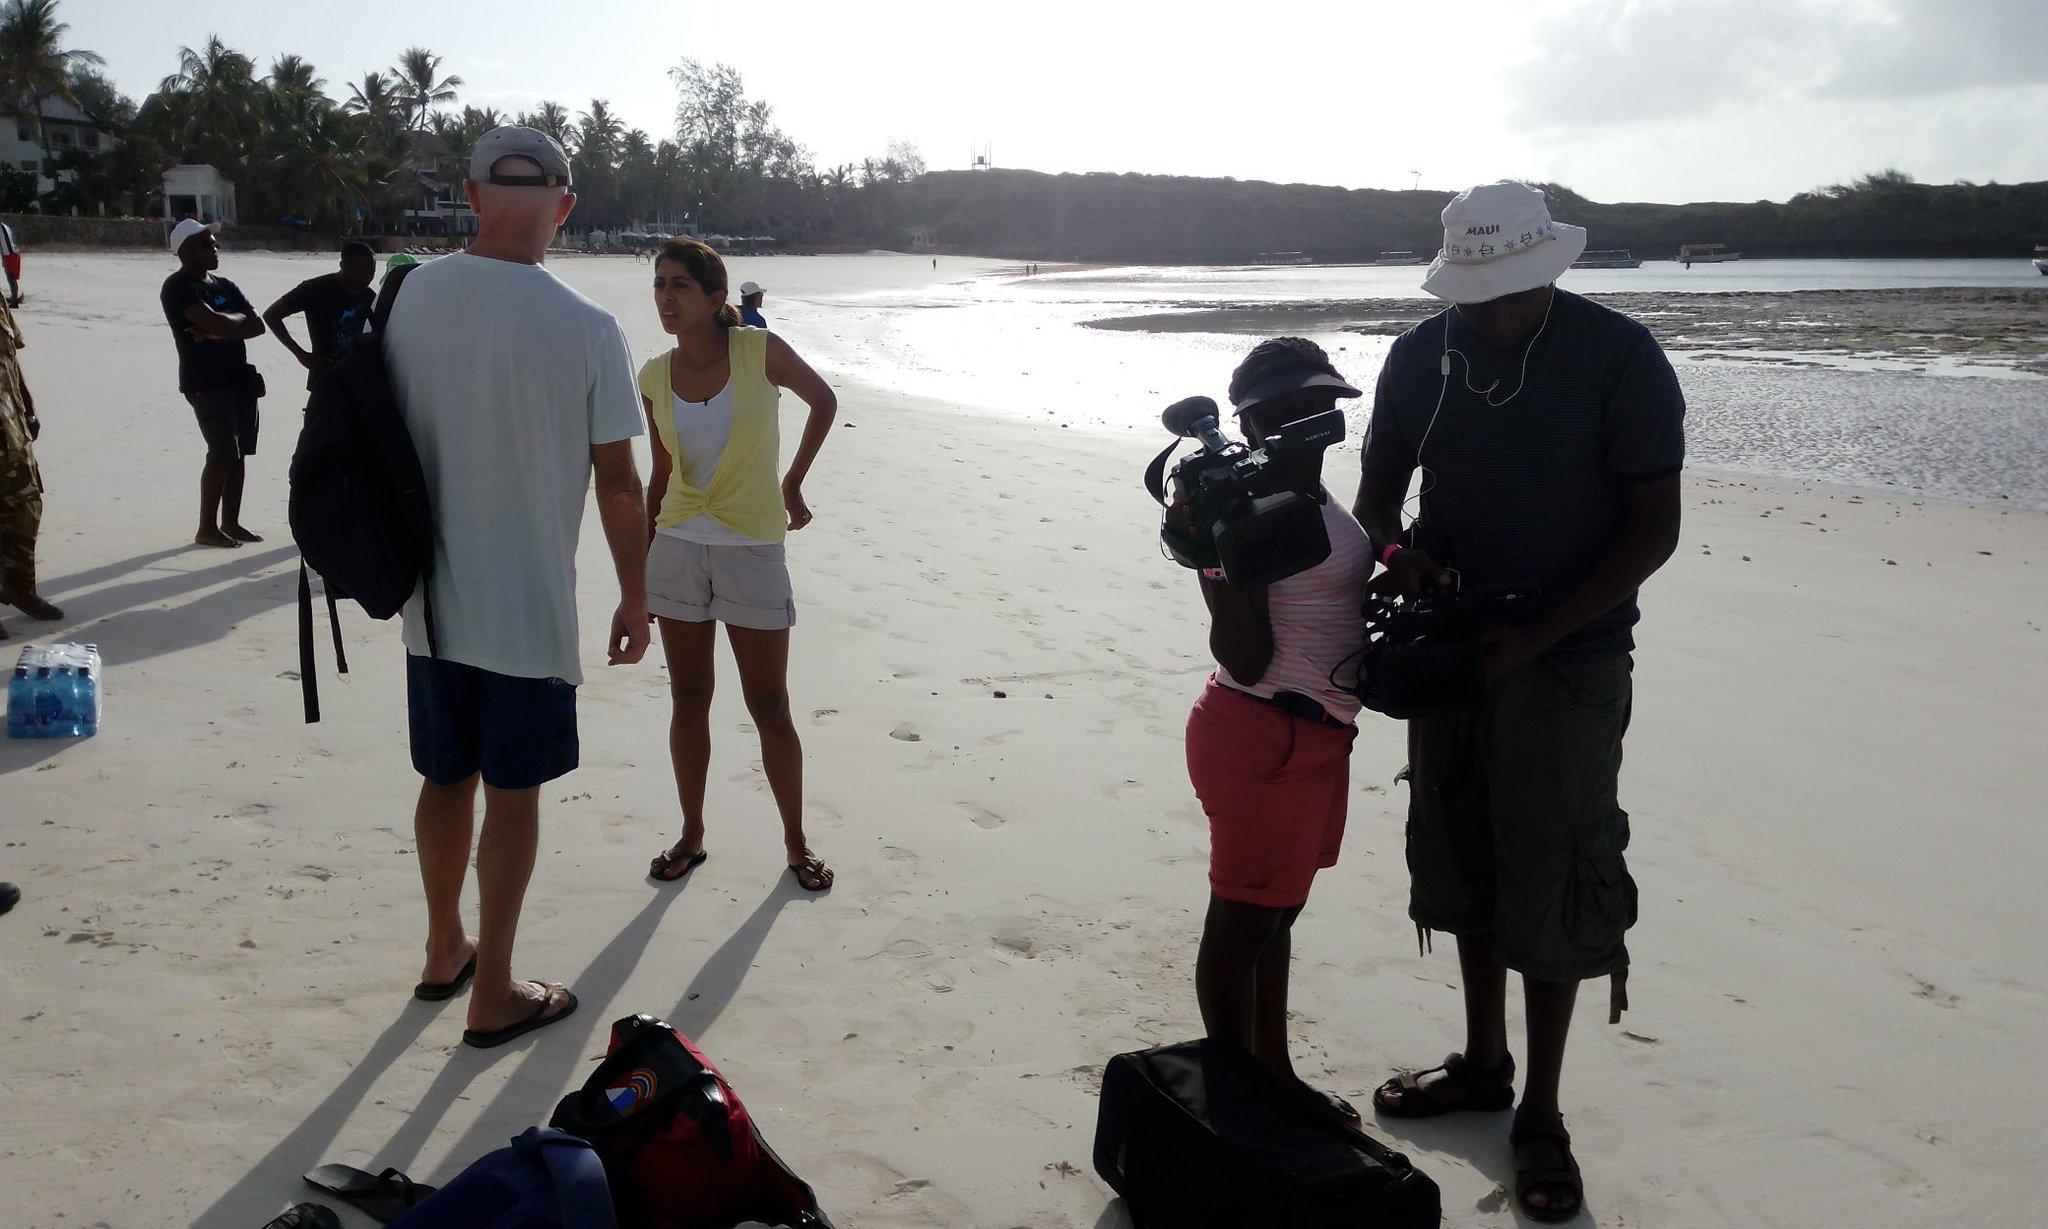 #NTVWILD Team #OnLocation in #Watamu to film #dolphins 🐬 @SmritiVidyarthi @ntvkenya https://t.co/md6ch26O5s